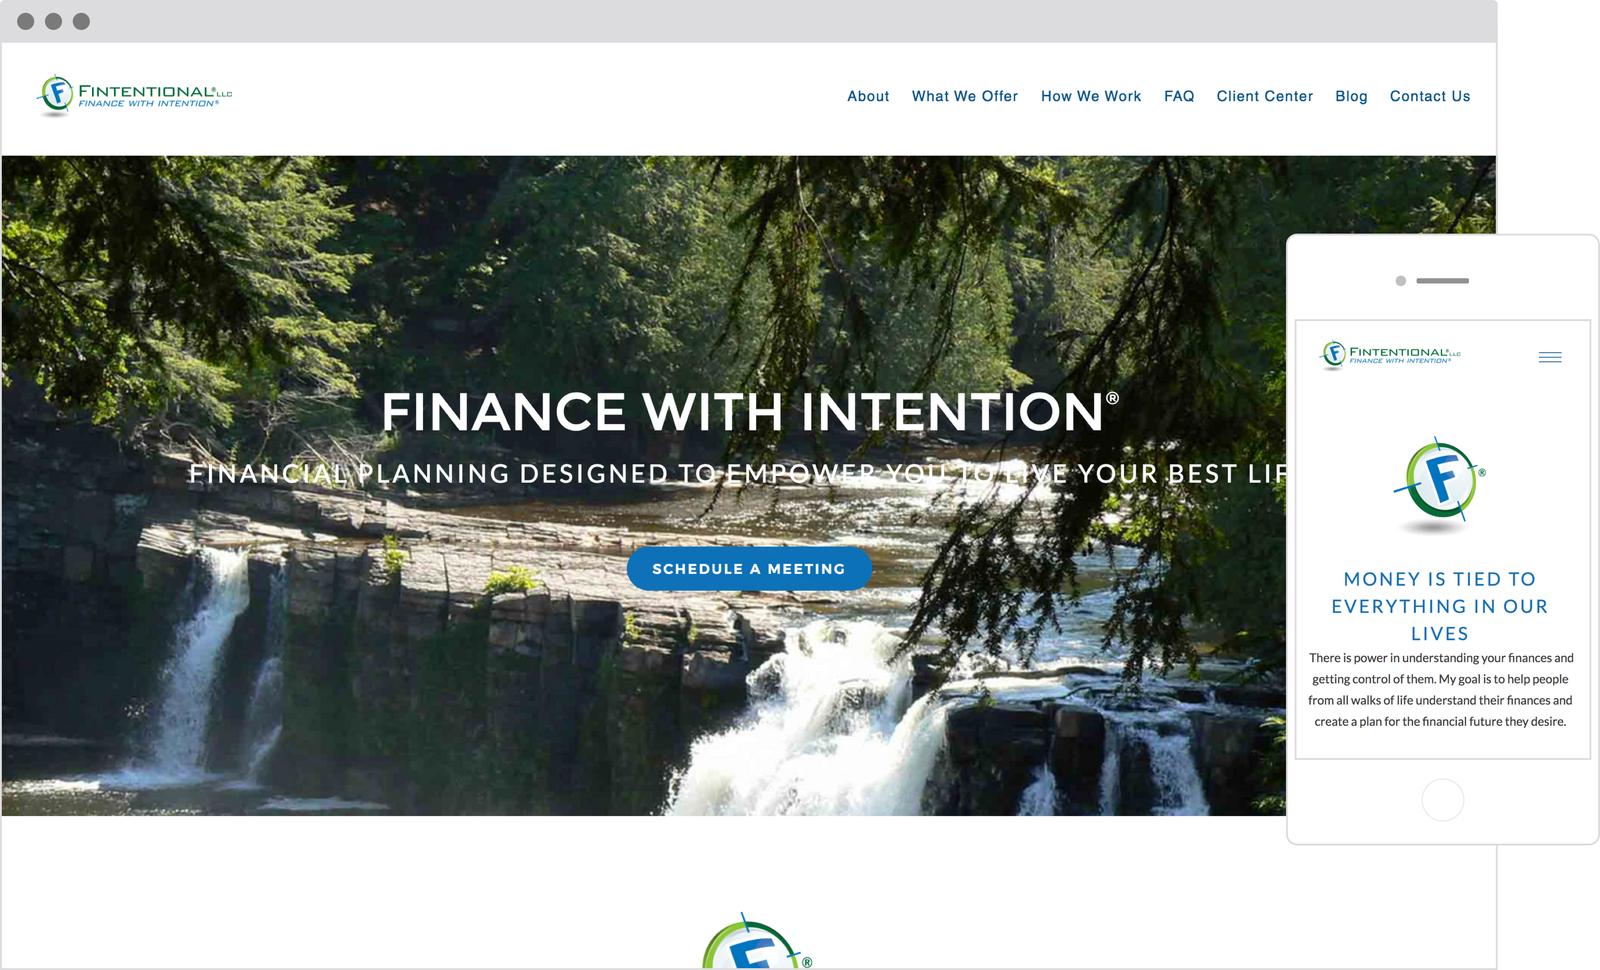 Fintentional- Best Designed Financial Advisor Website